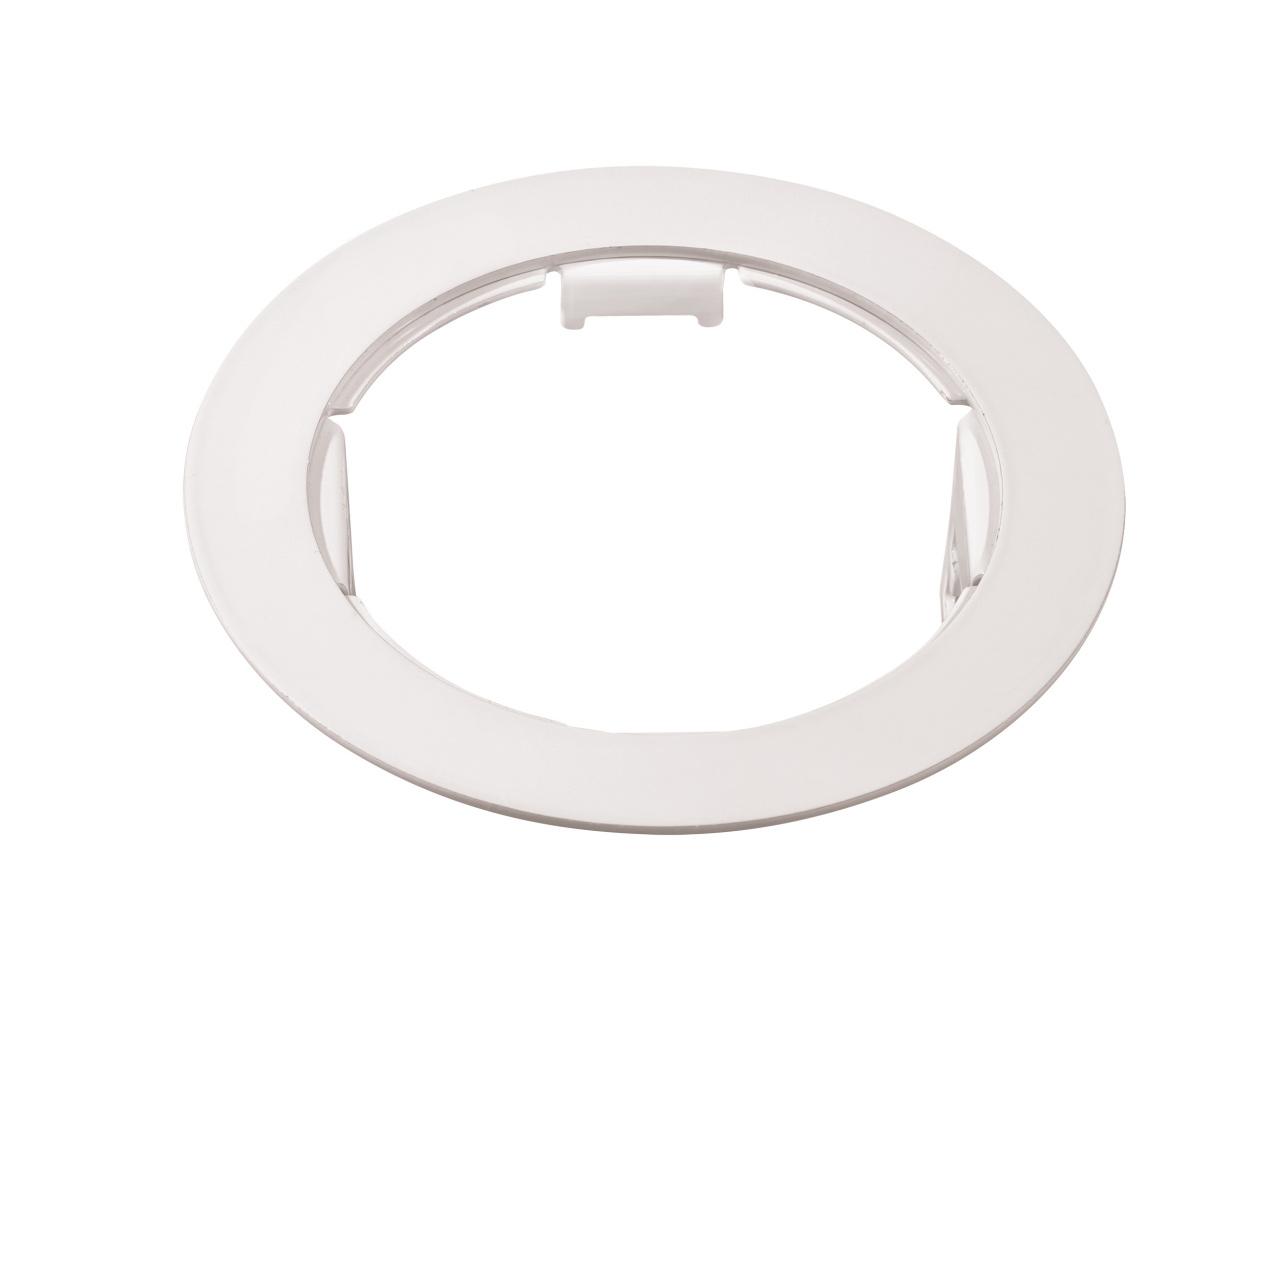 Рамка Domino round МR16 белый Lightstar 214616